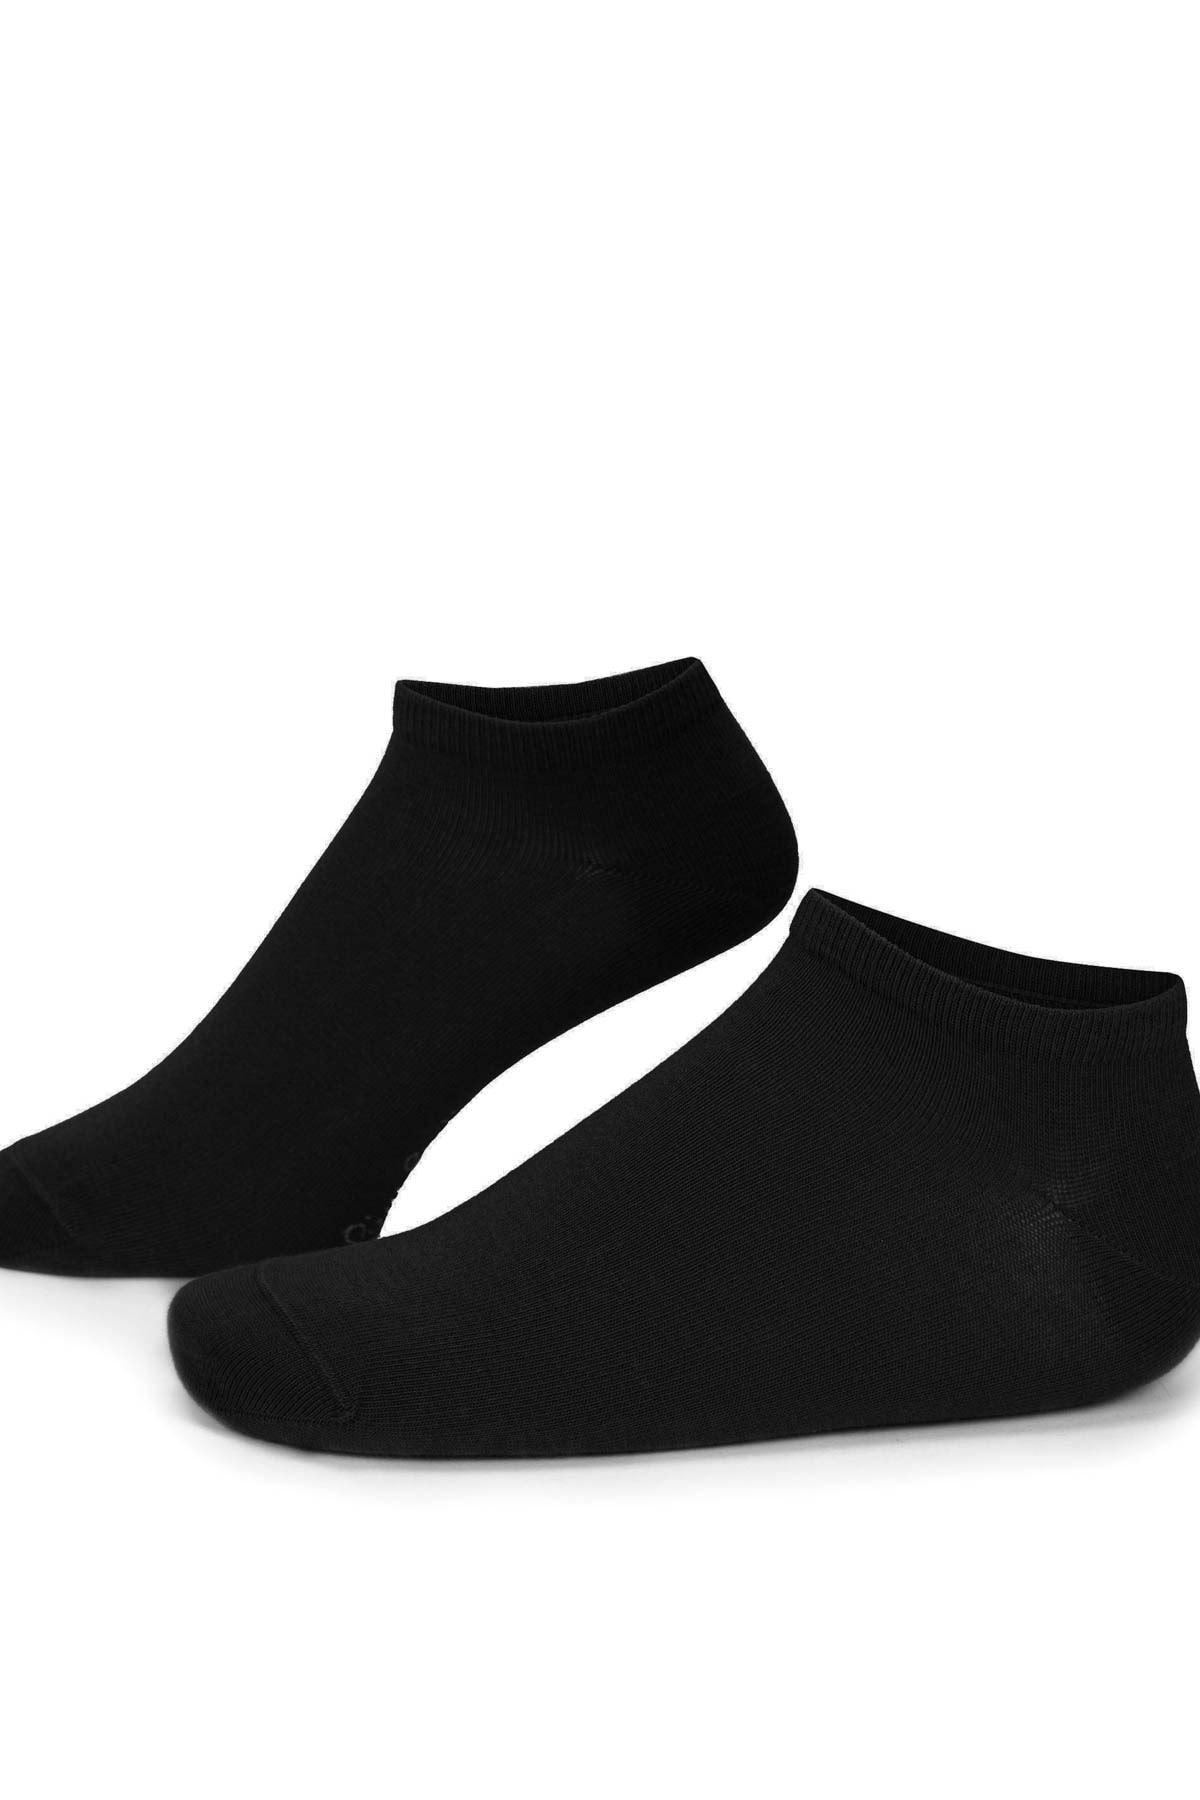 5 Adet Siyah Erkek Patik Çorap (40-44)